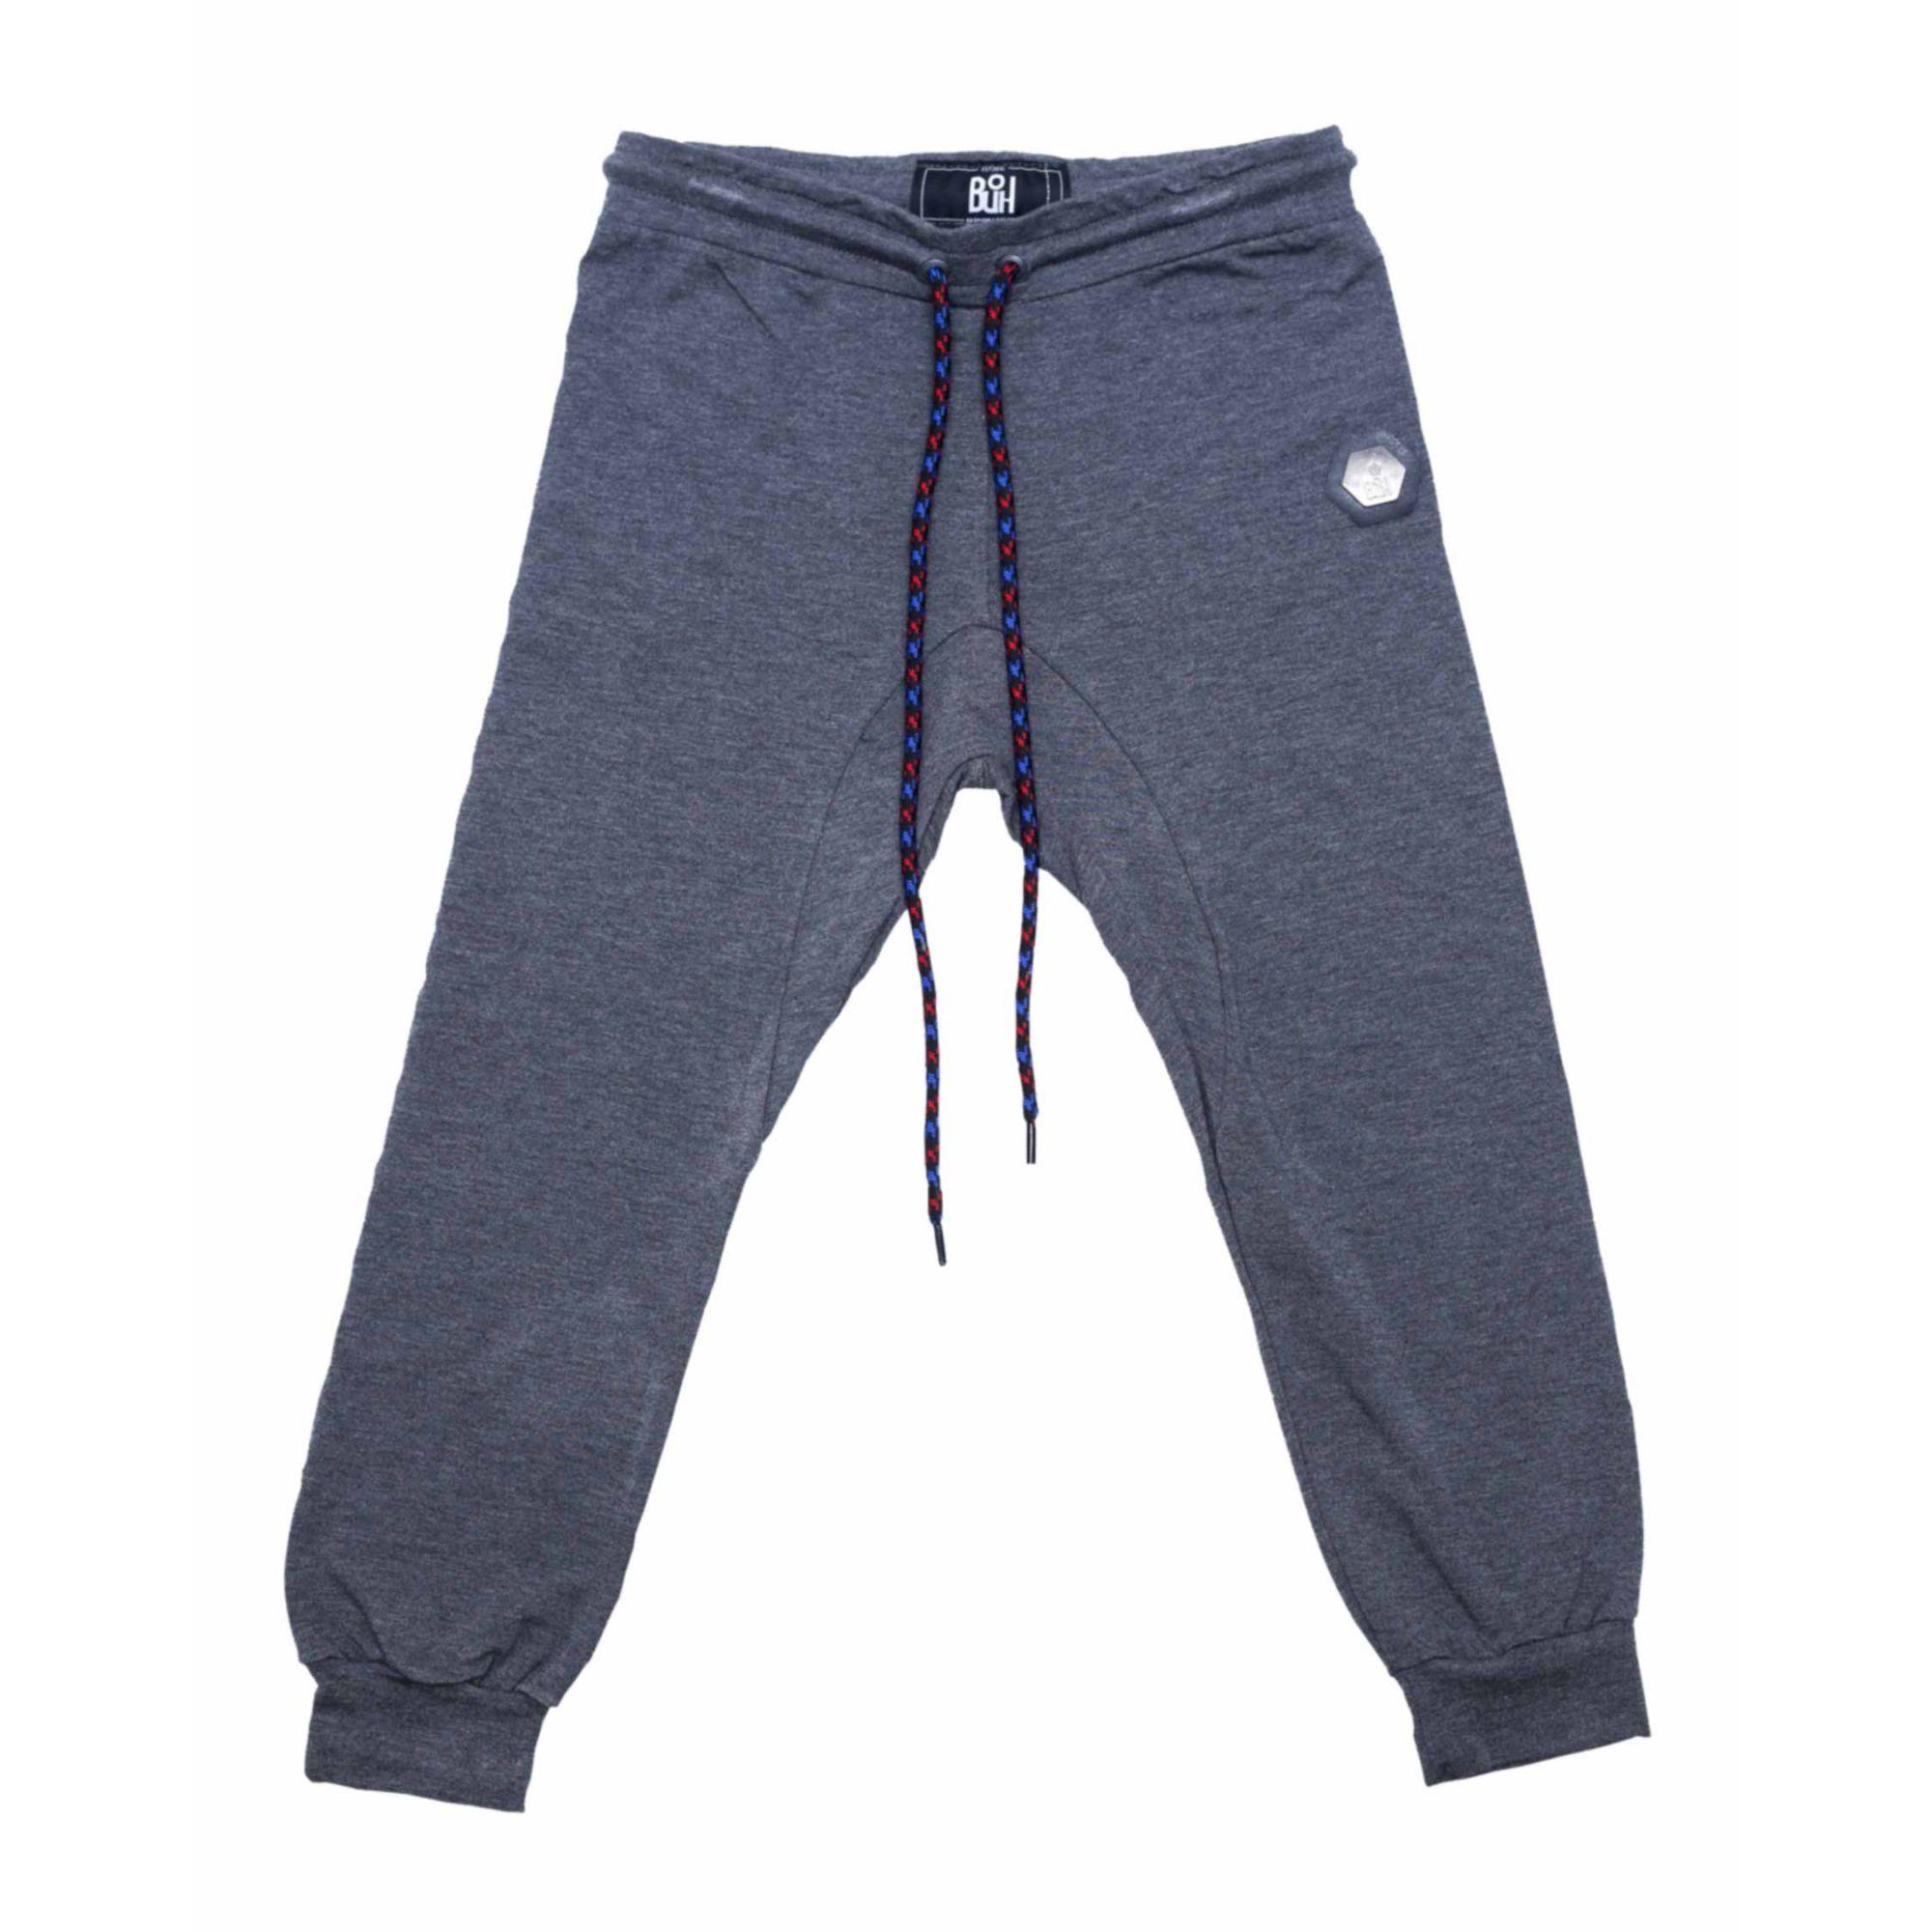 Calça Buh Kids Basic Grey